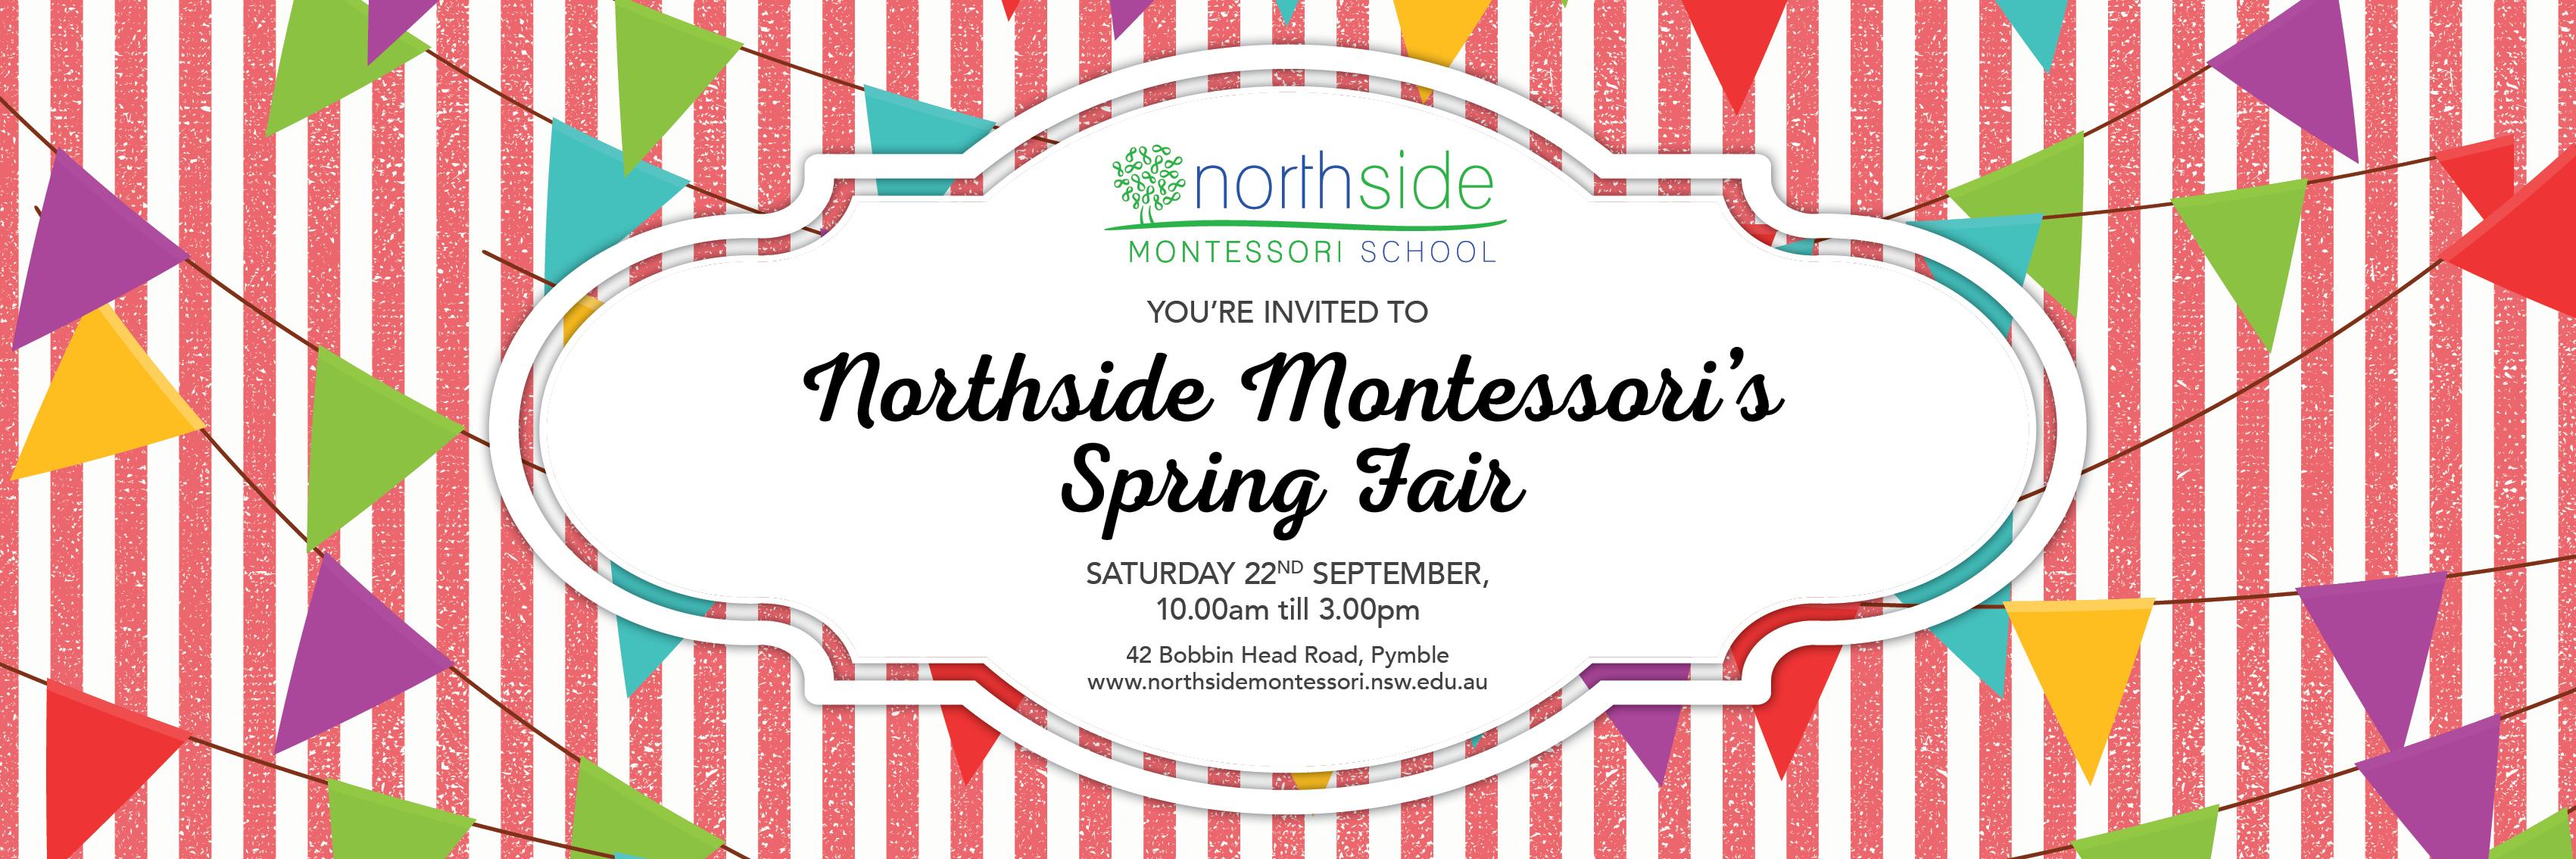 Northside Montessori 40th Anniversary Spring Fair Banner